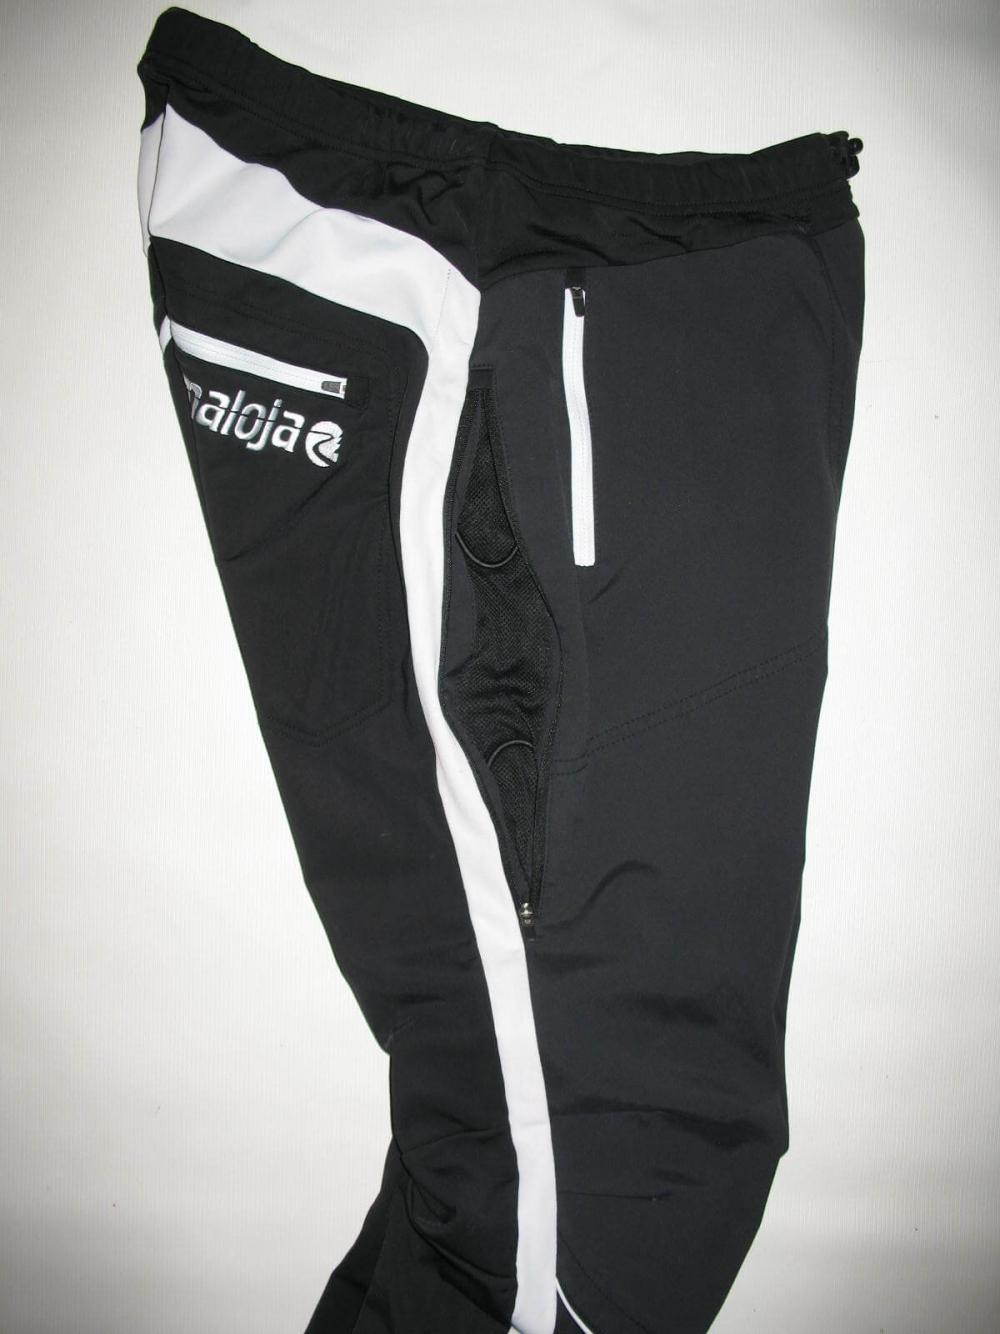 Велобрюки MALOJA sacha softshell pants (размер XL) - 7